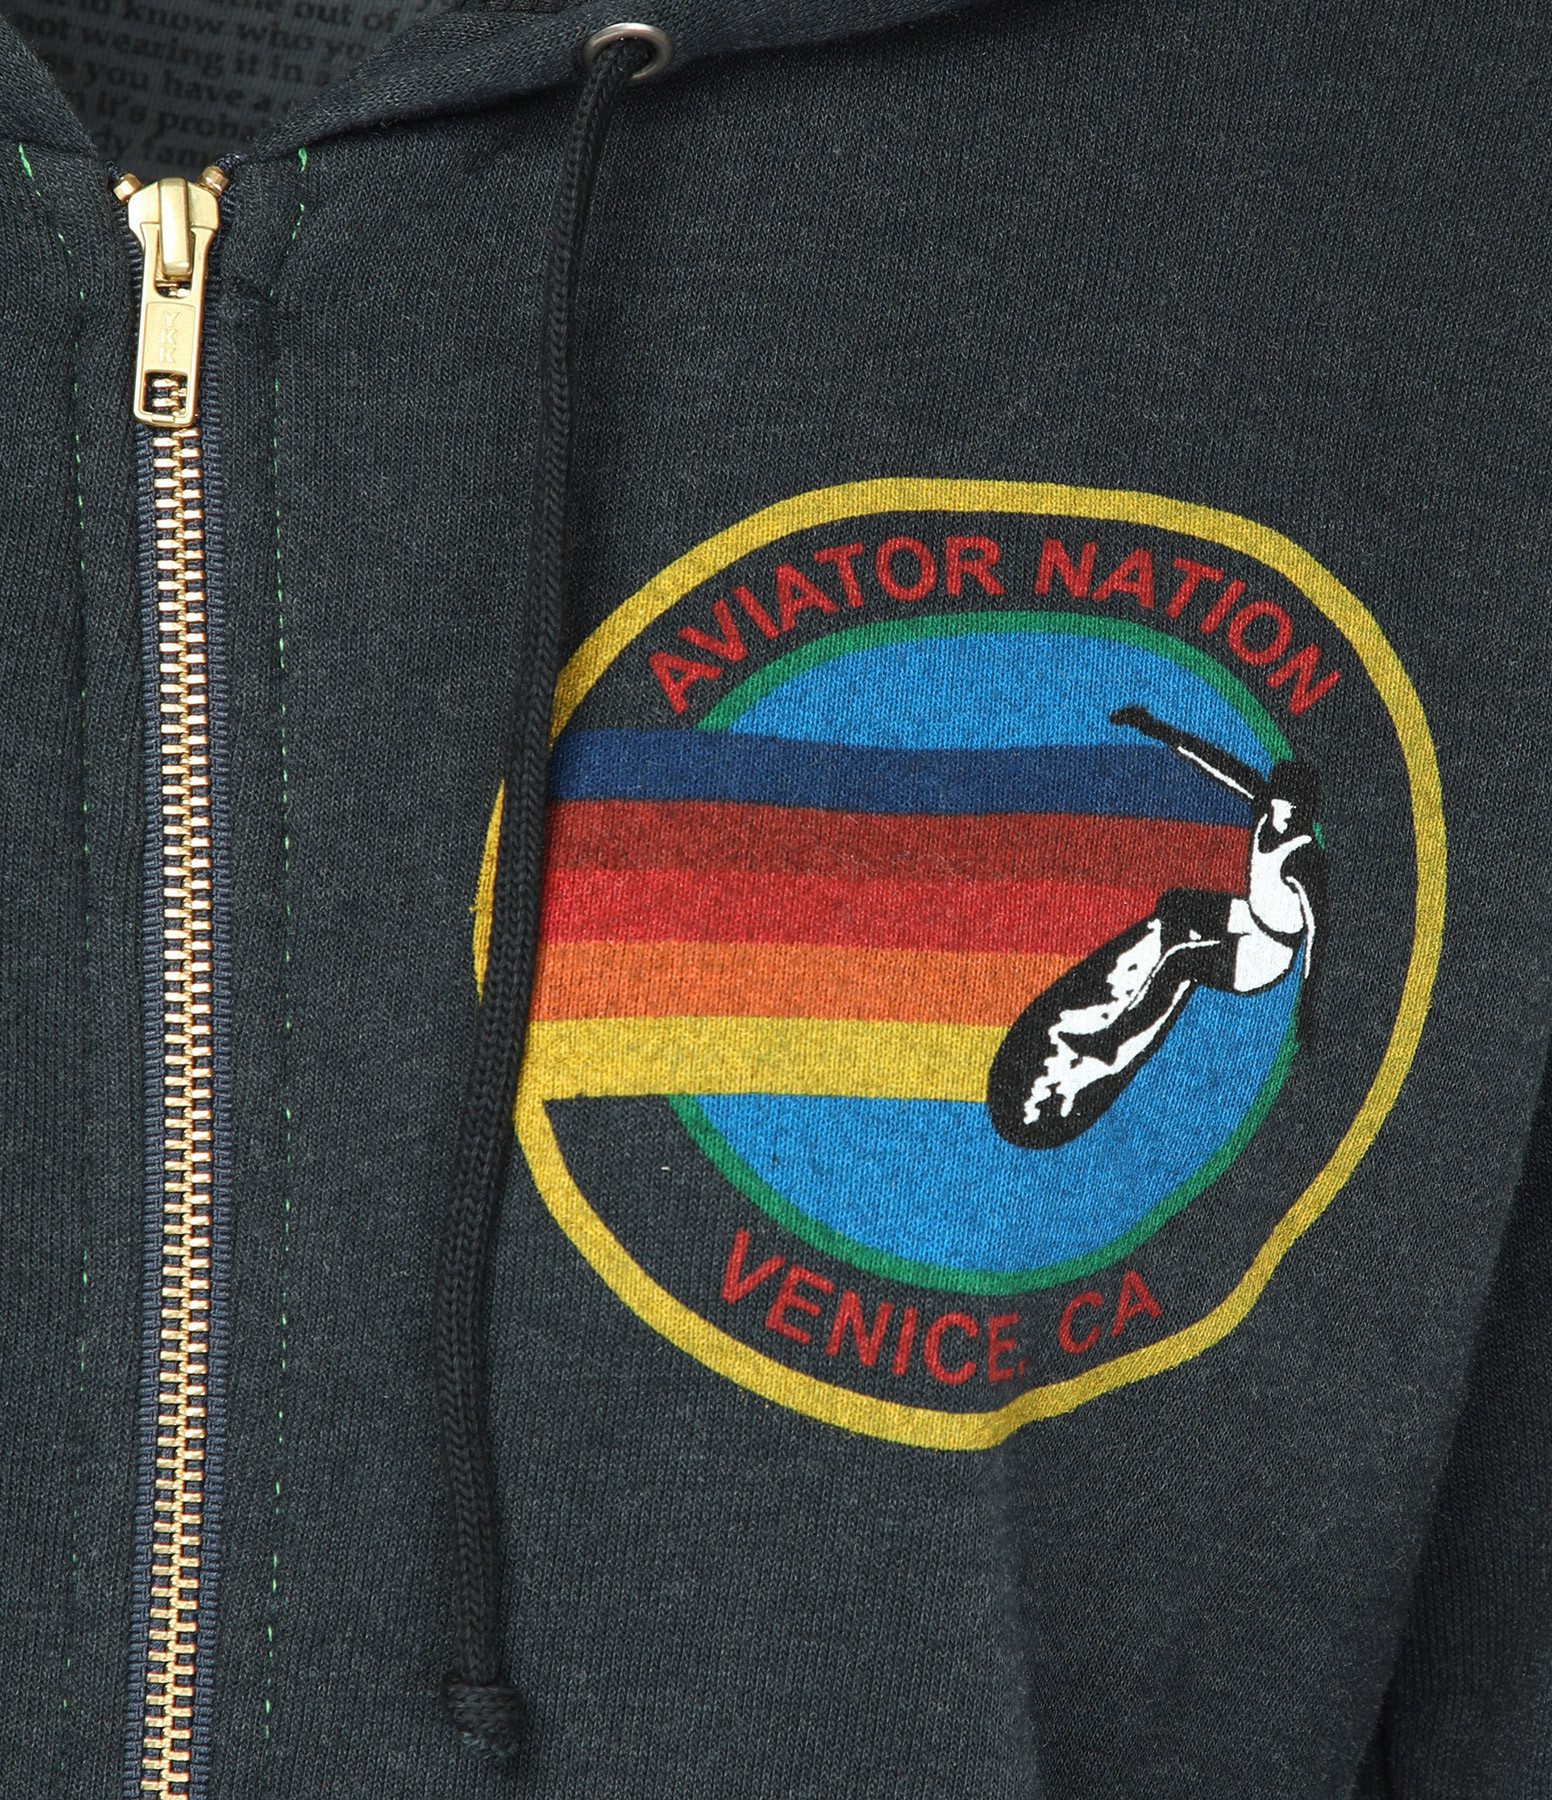 AVIATOR NATION - Sweatshirt Aviator Nation Coton Charbon